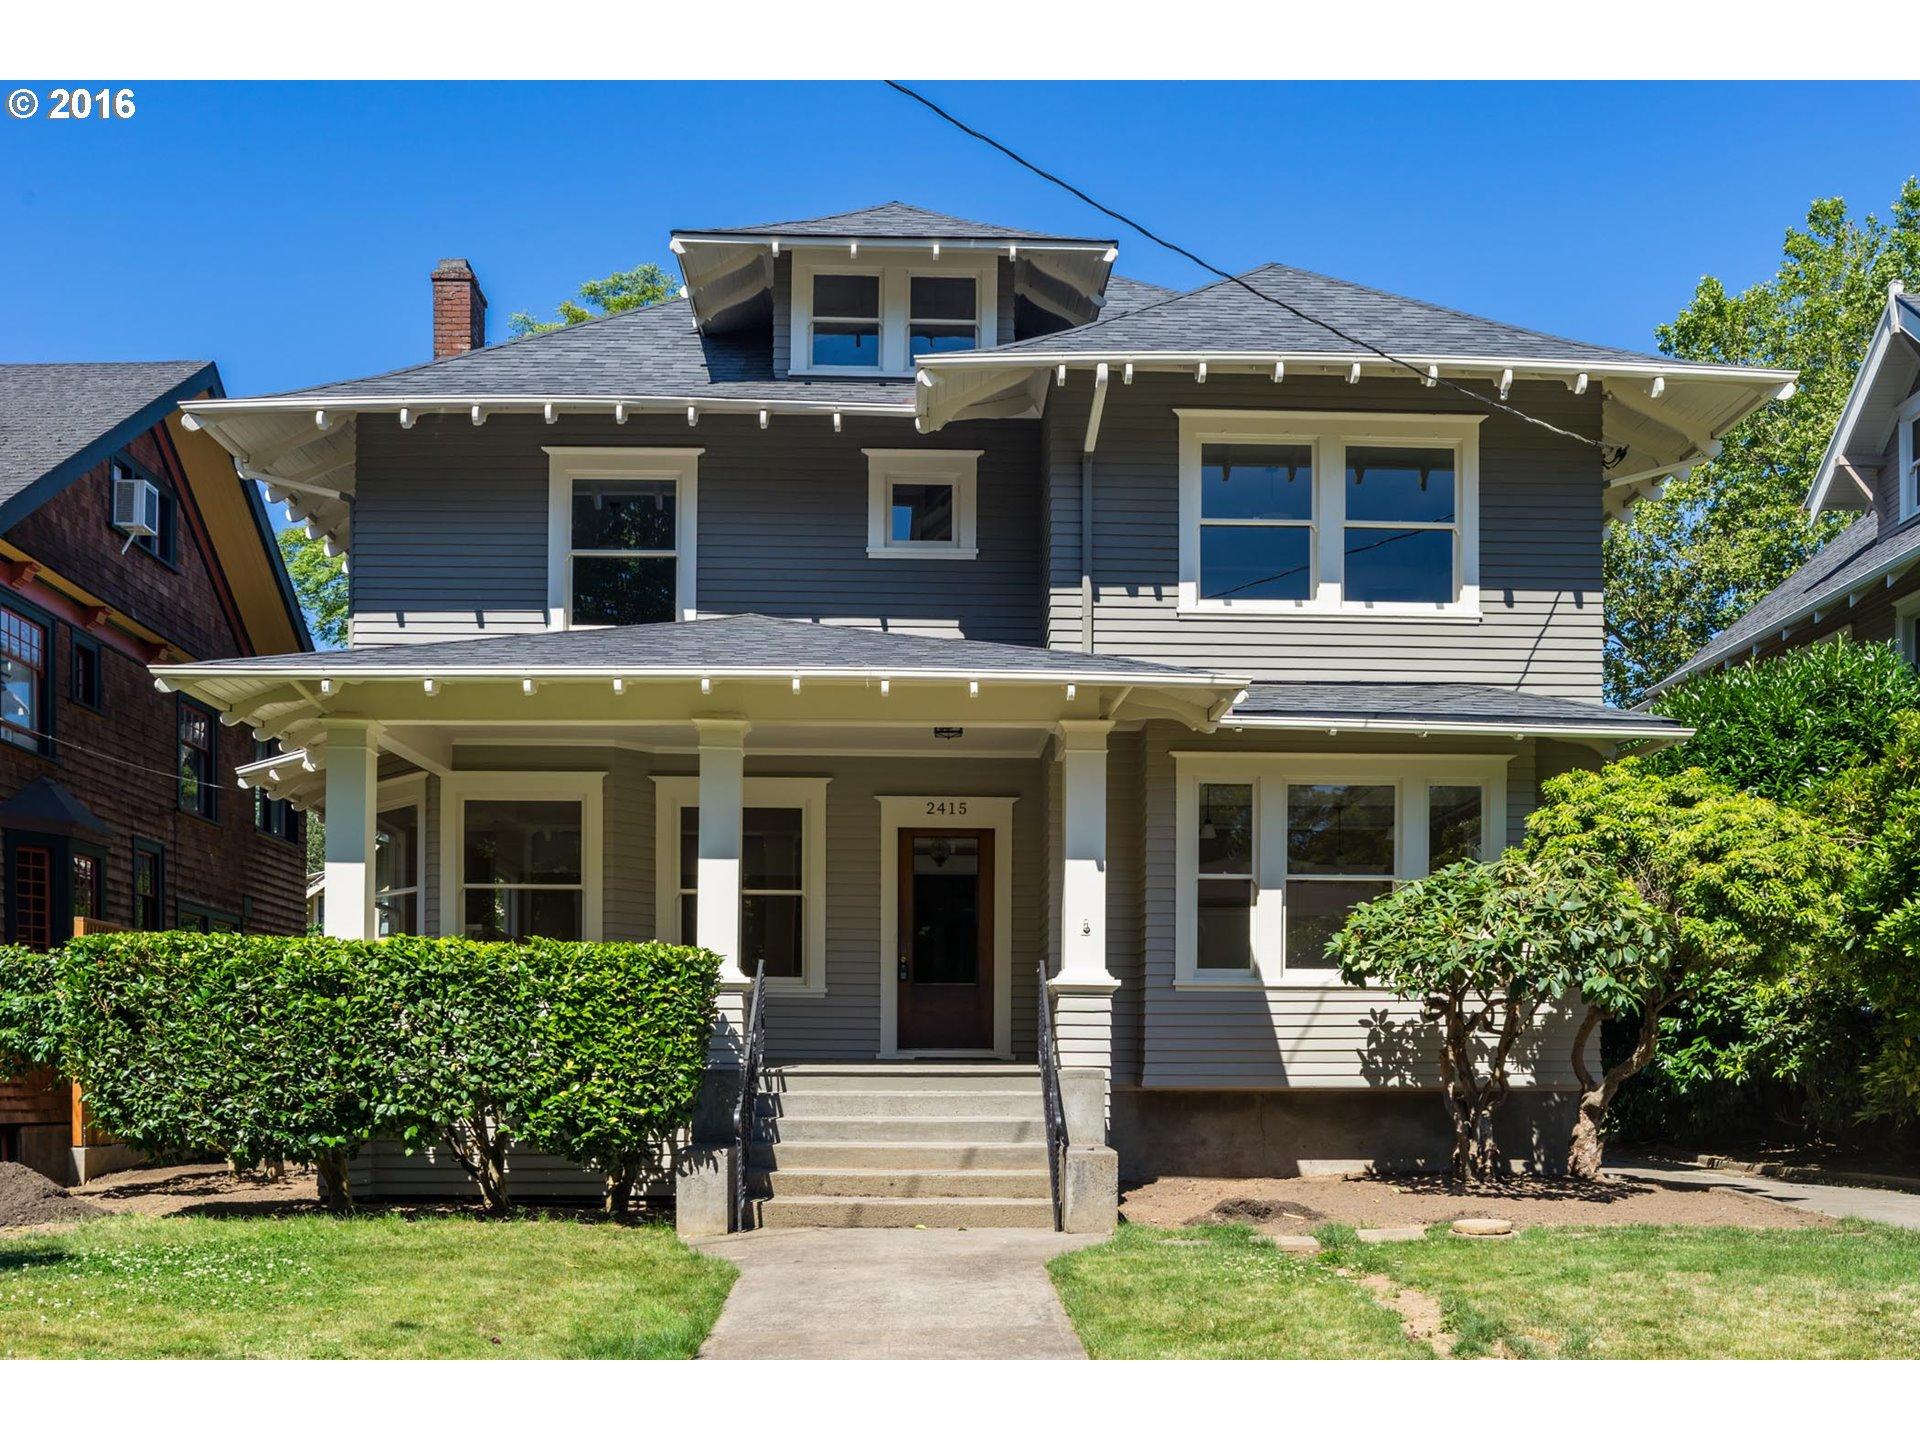 2415 NE 17TH AVE, Portland OR 97212